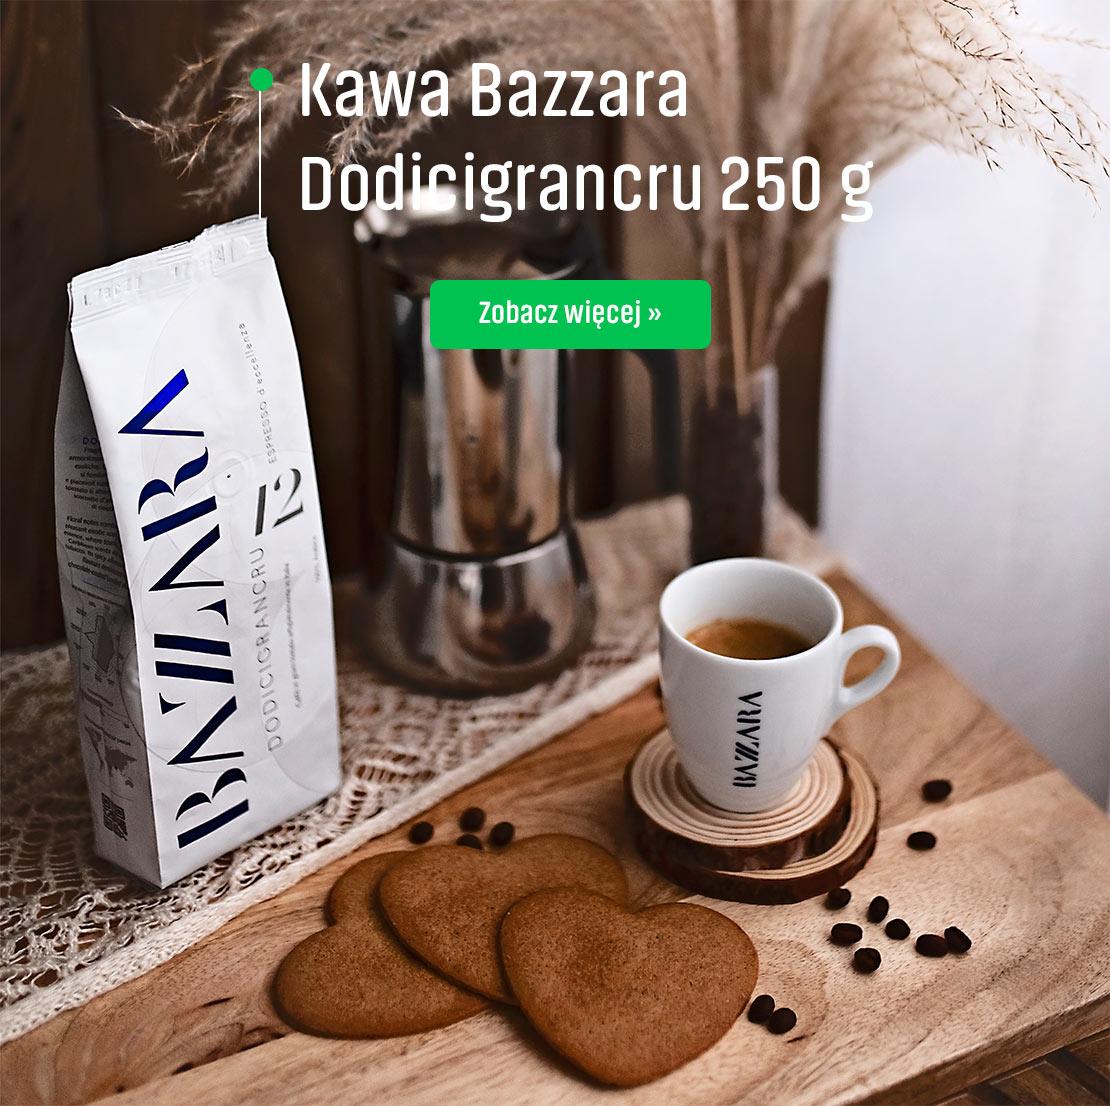 Syrop Monin z kawą